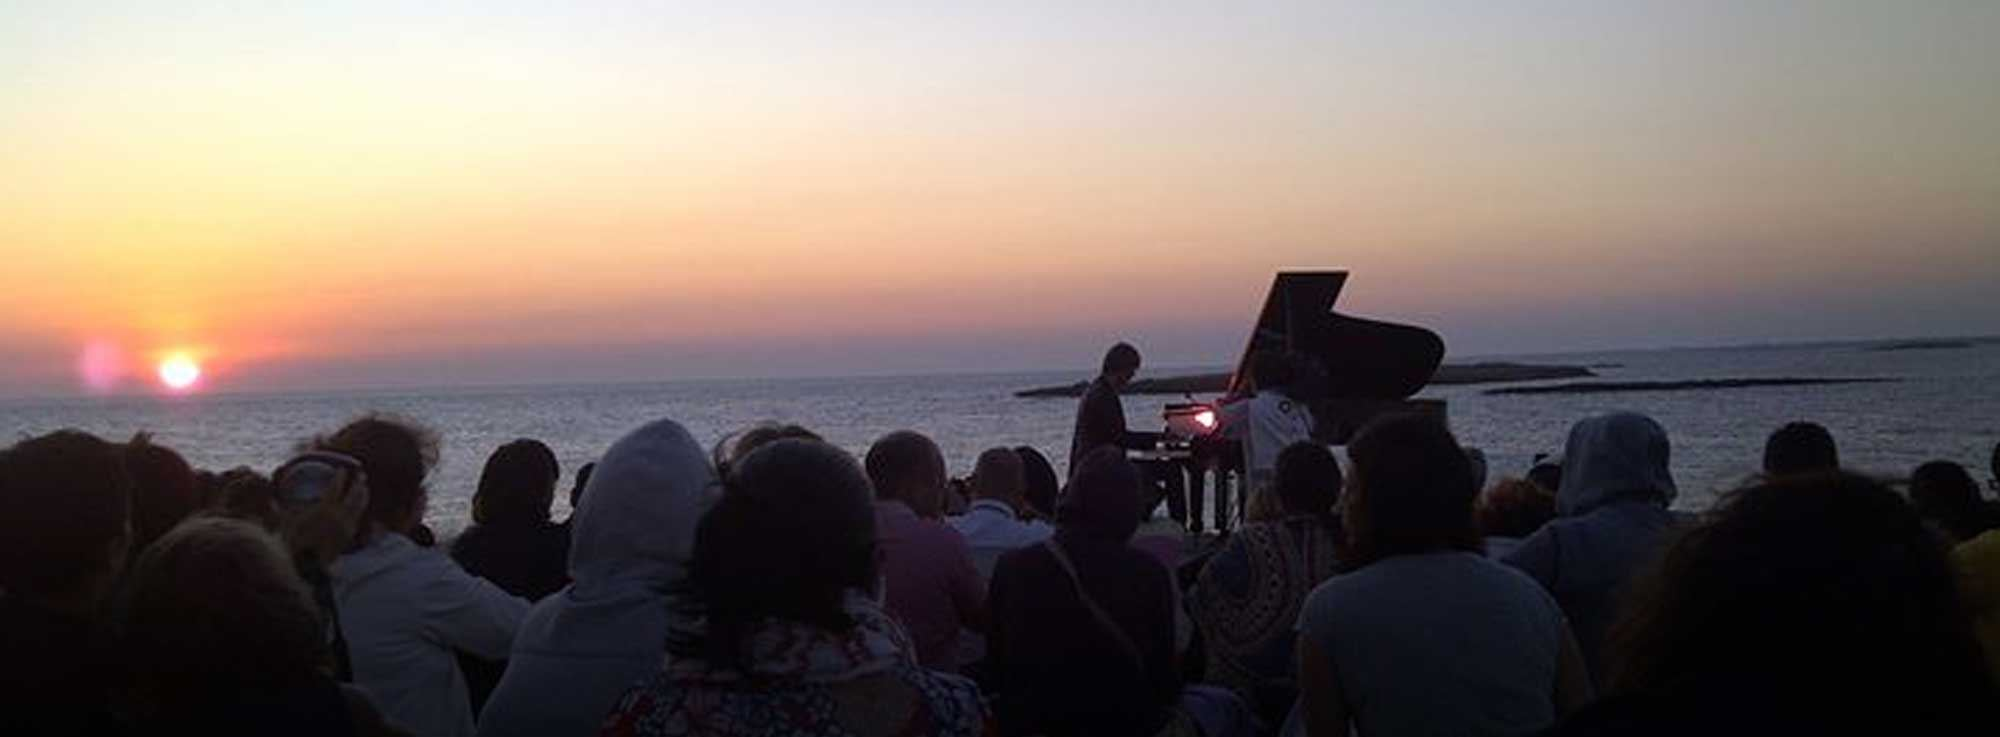 Torre Guaceto: Robert Bisha: concerto all'alba